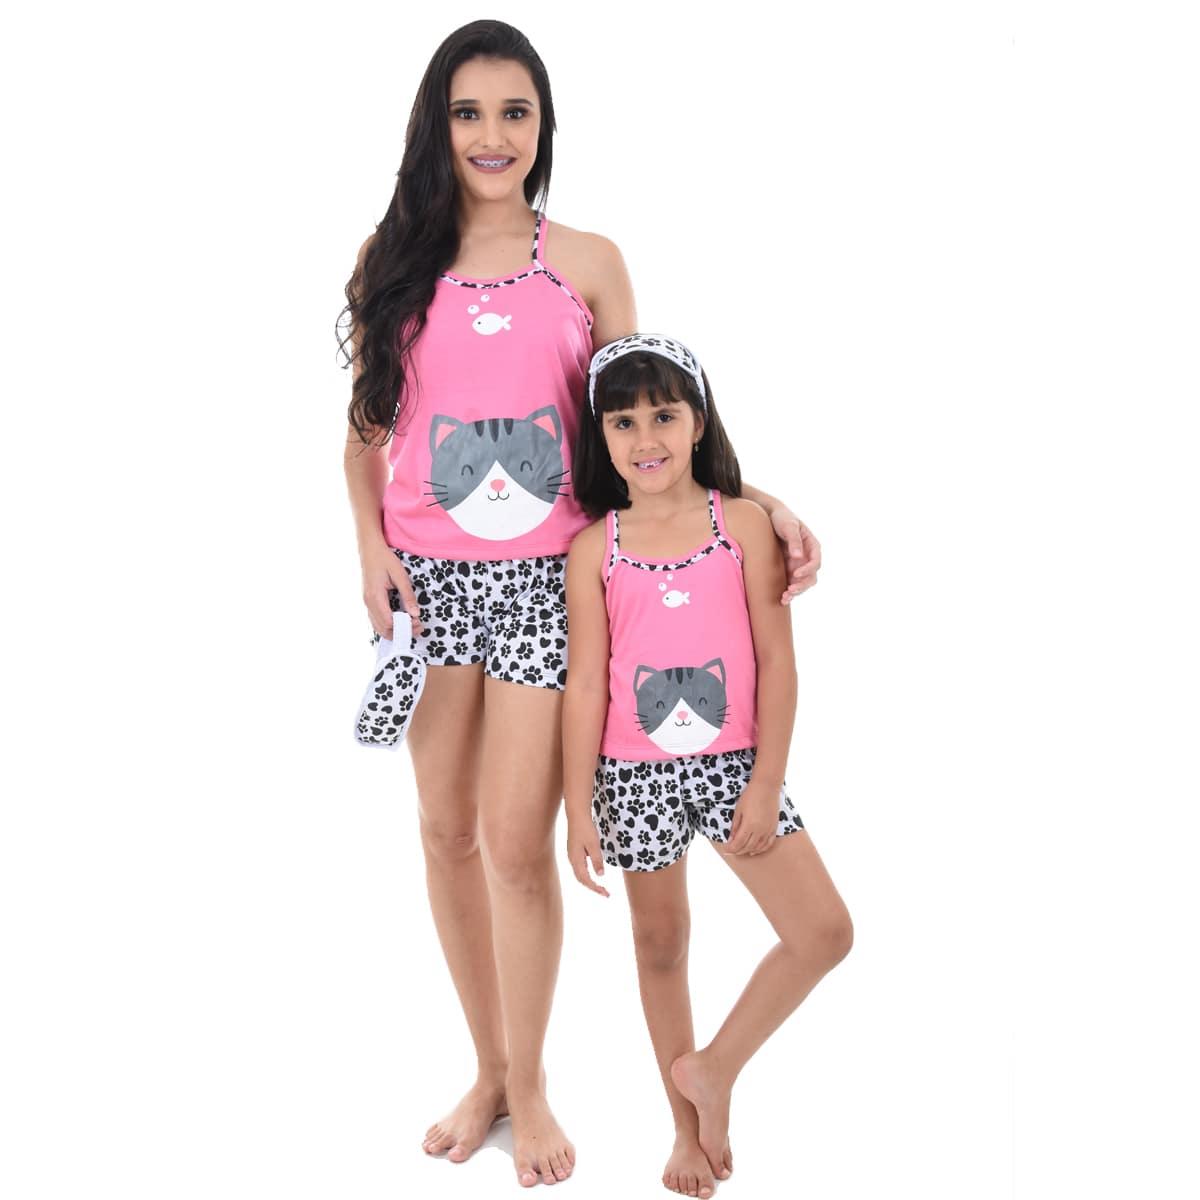 Baby Doll Short Doll Alça Feminino Adulto Com Tapa Olho Malha Verão Gato Ref: 296